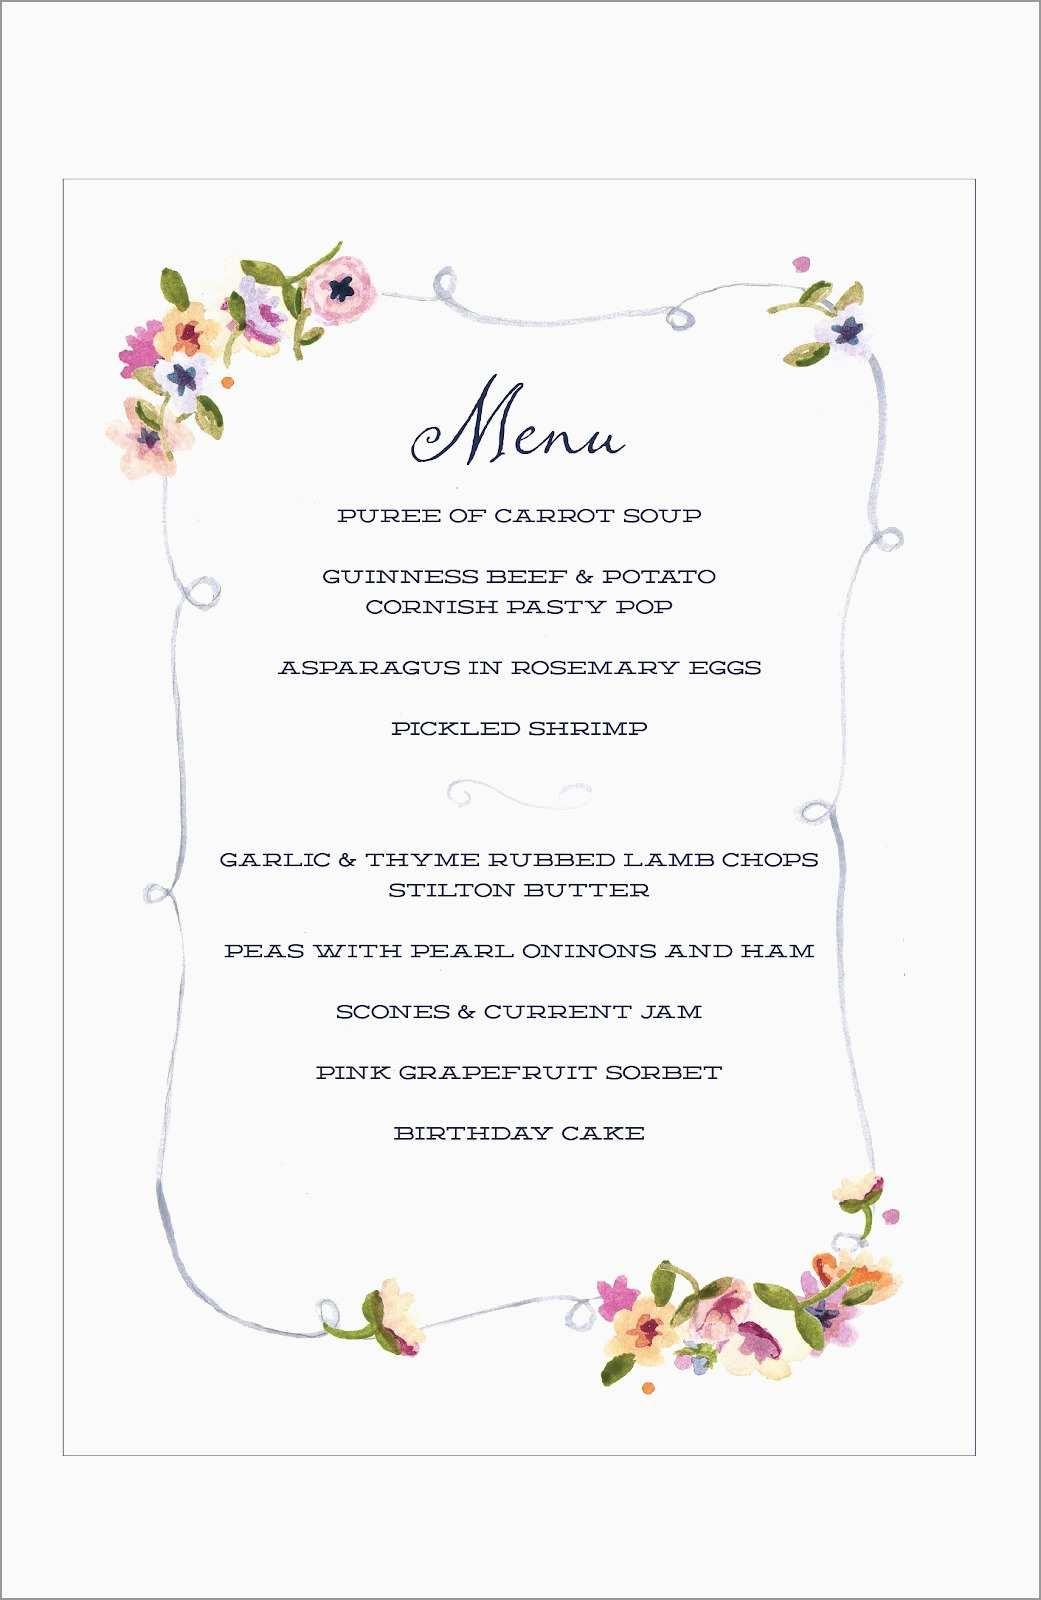 Best Of Free Printable Dinner Party Menu Template | Best Of Template - Free Printable Dinner Party Menu Template